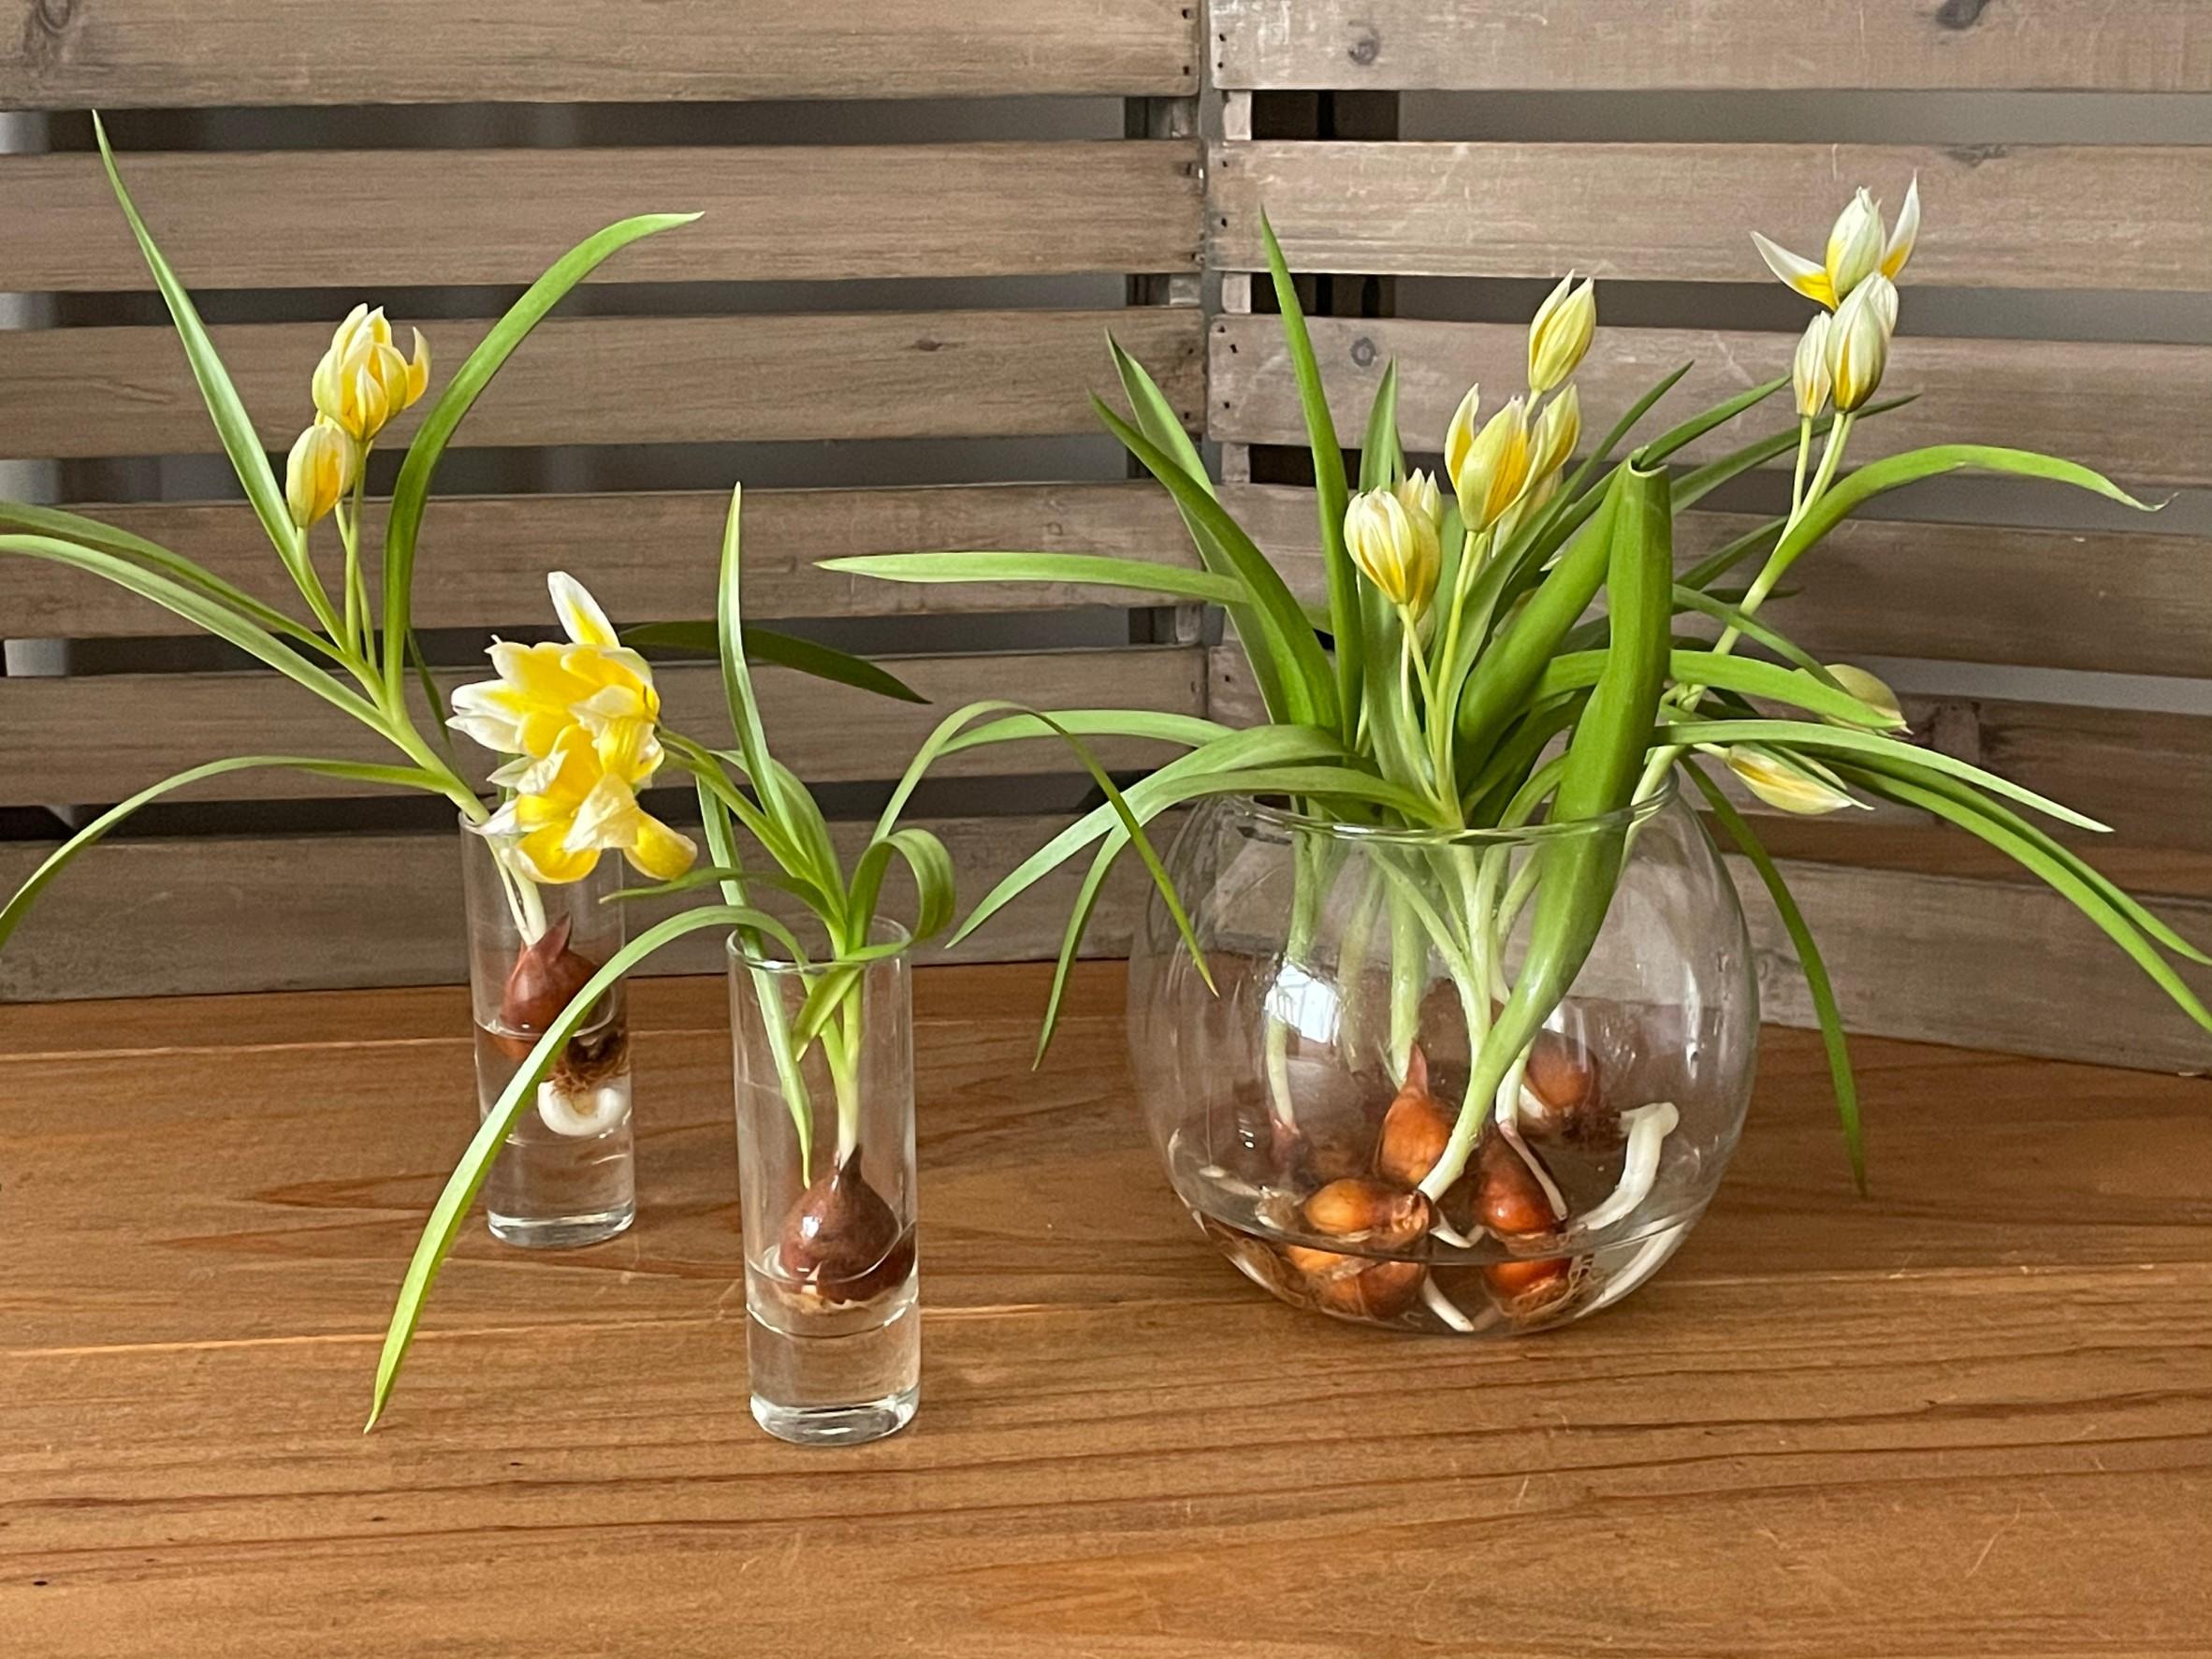 Glass Flower vase デイリーに使えるフラワーベース